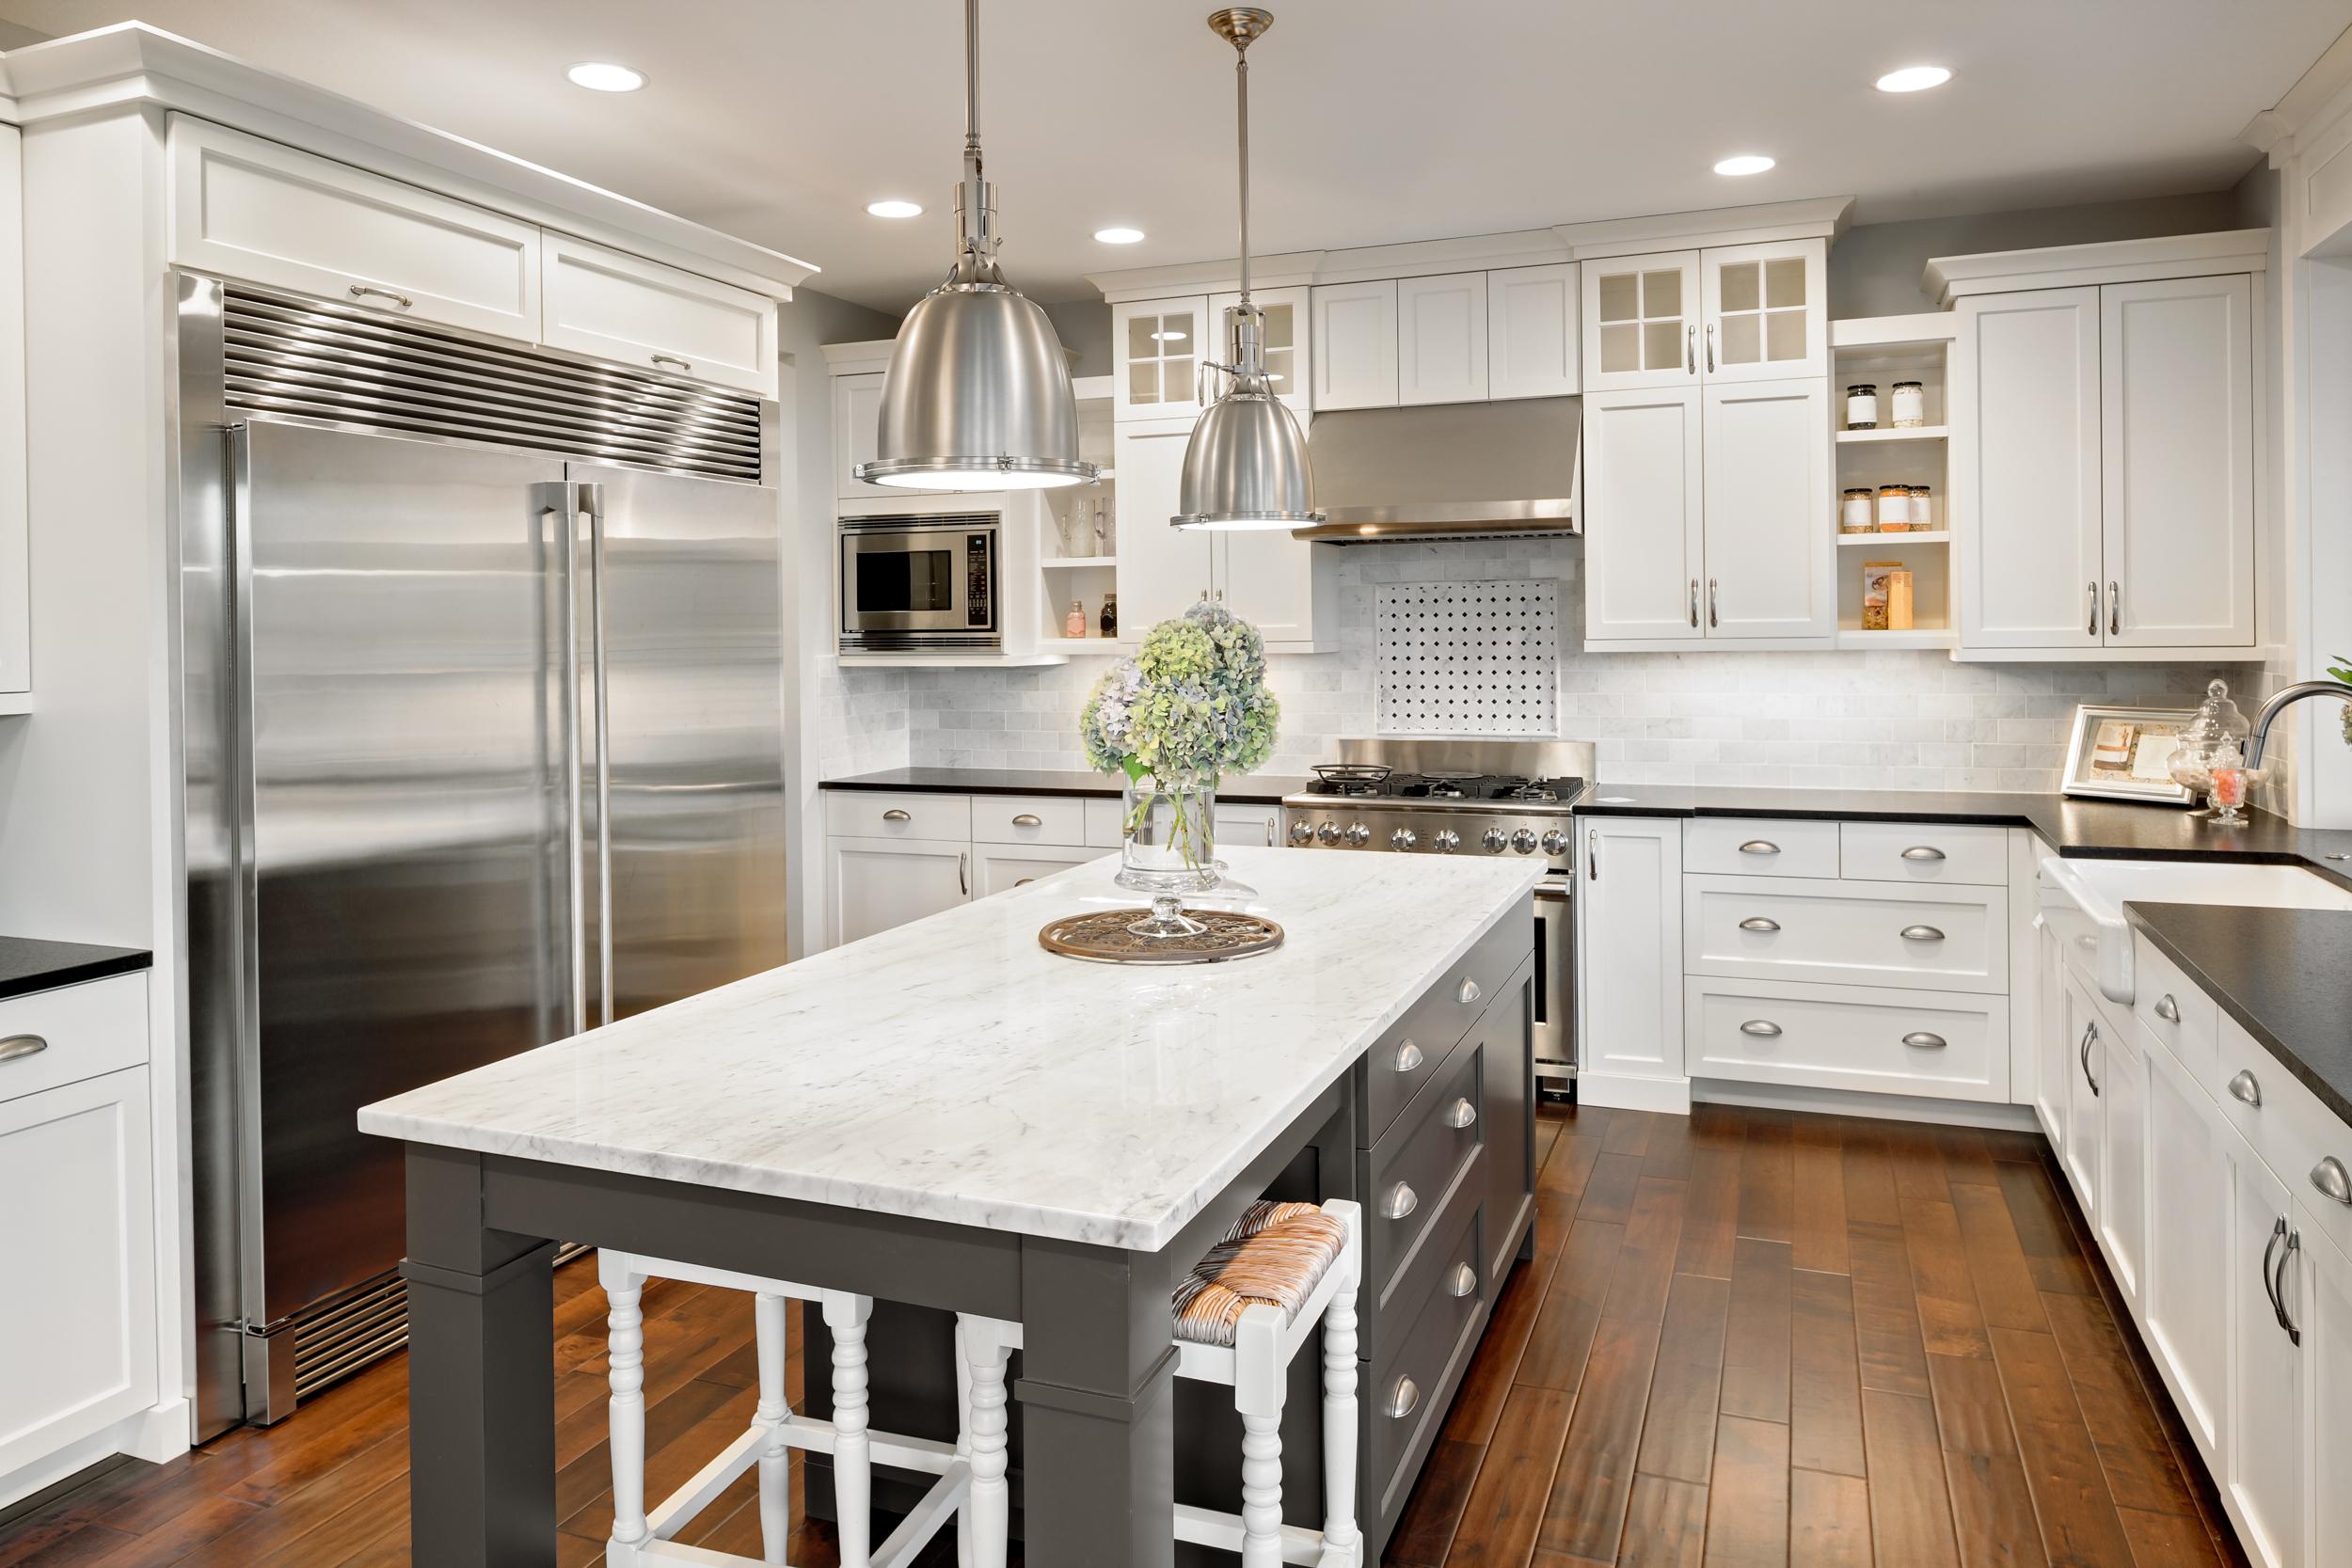 A modern kitchen with wood flooring